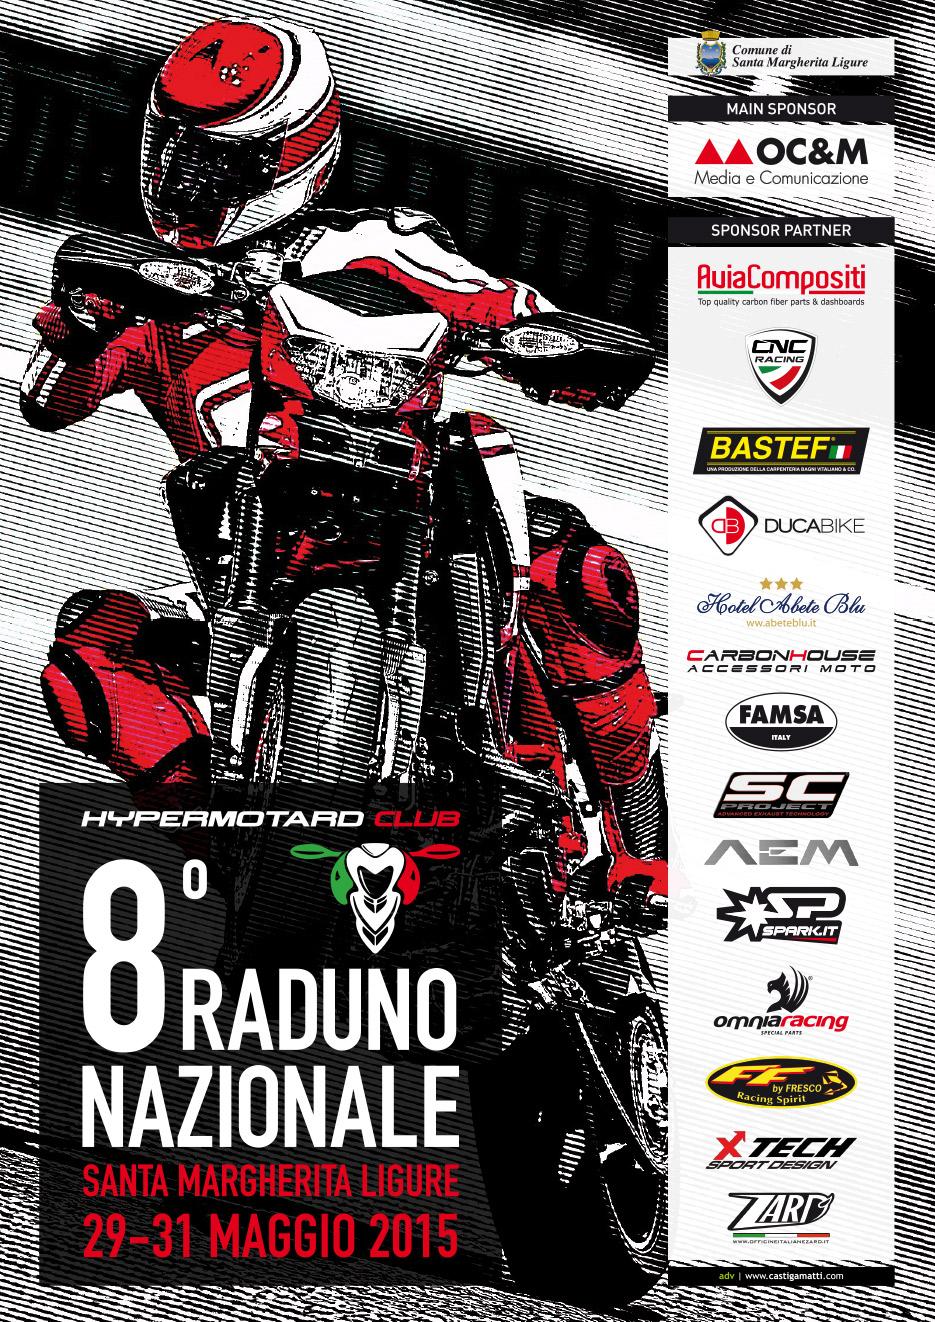 hyper-club-LOC-RADUNO-2015-V15-castigamatti